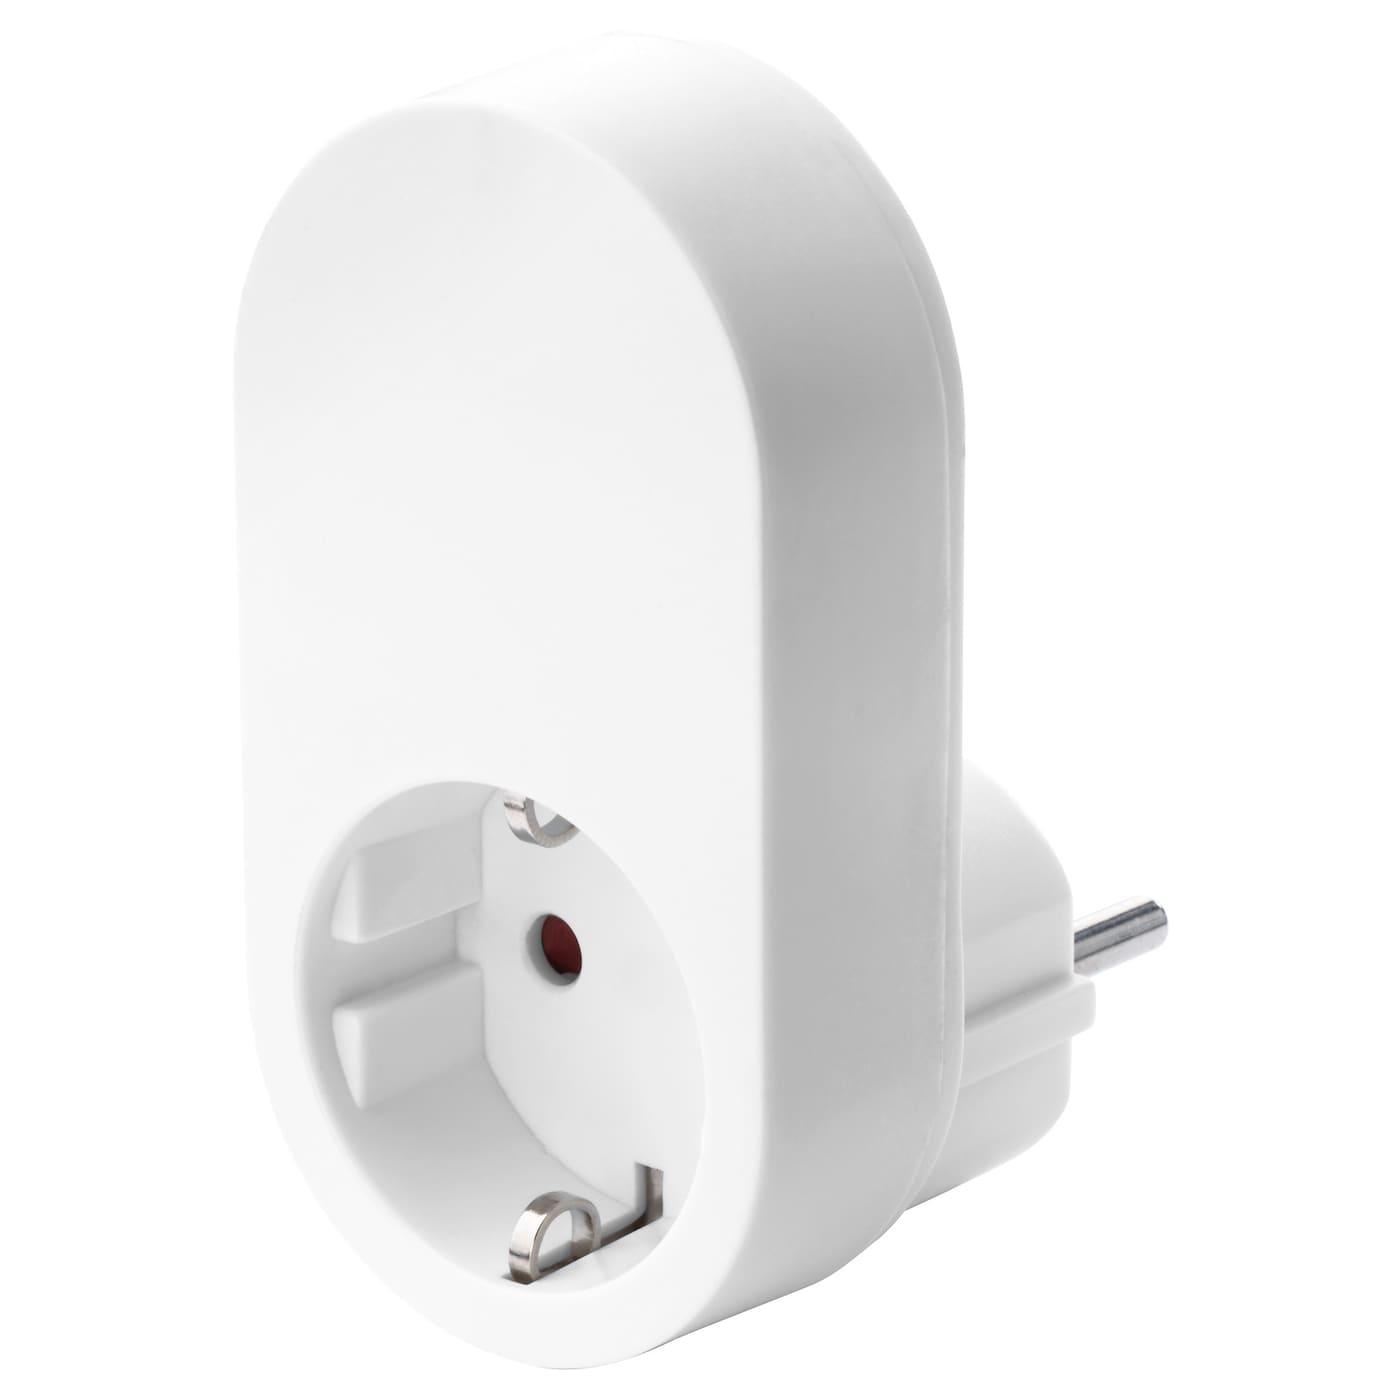 6 x IKEA TRADFRI Steckdose Zigbee Smart Home Homekit WLAN Fernsteuerung Alexa*